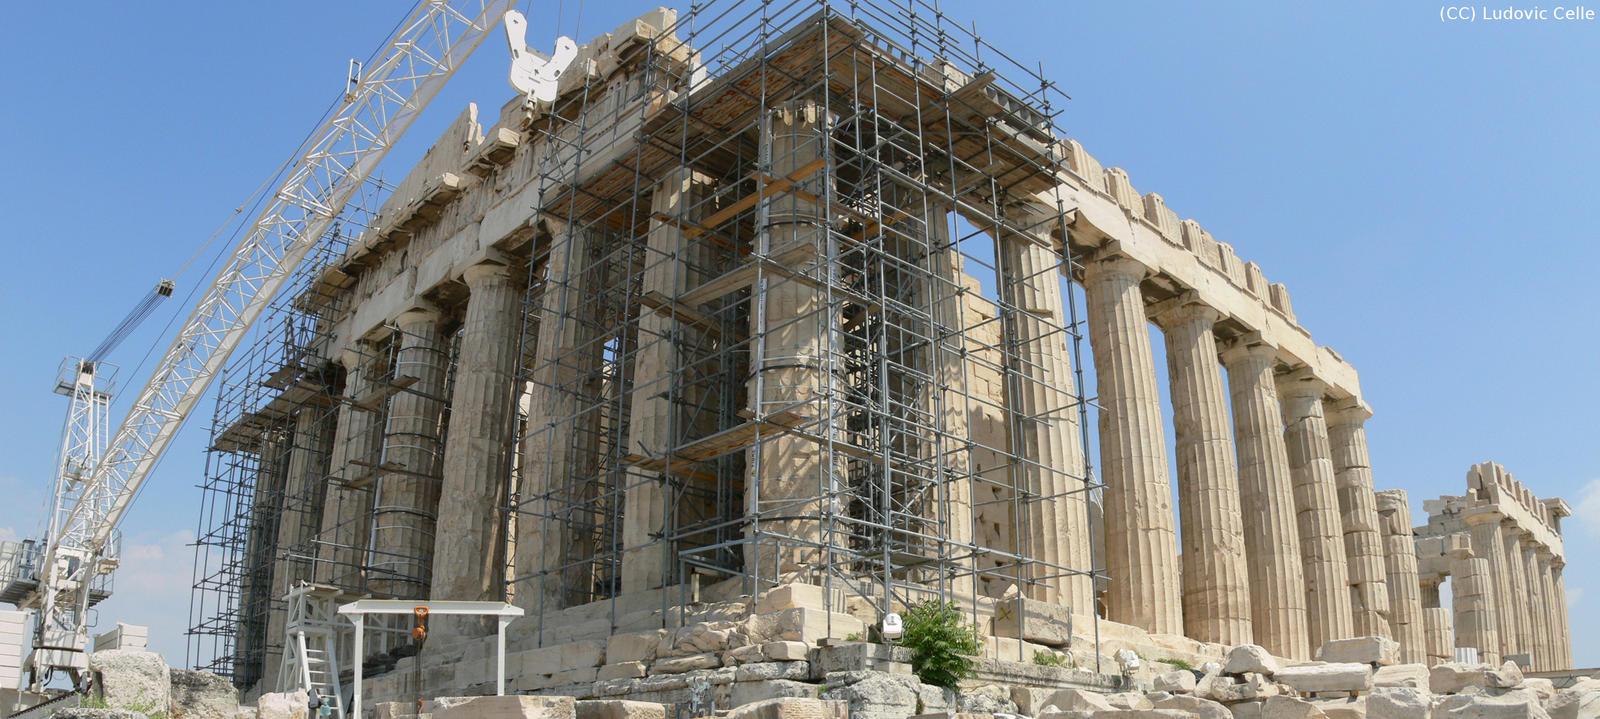 Greece - Rebuilding the Parthenon 02 (panorama)